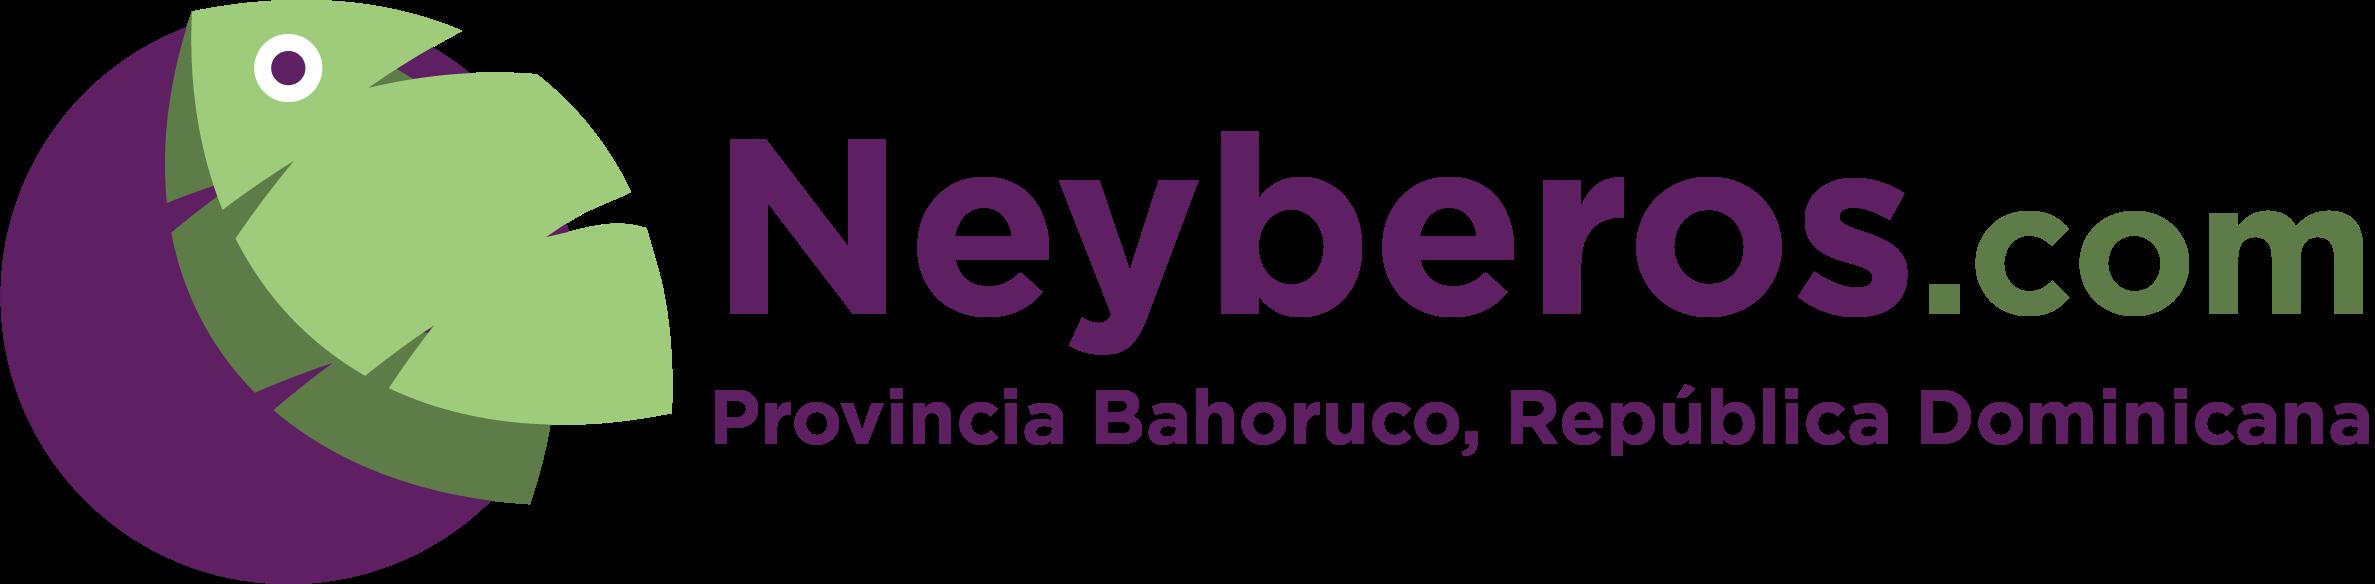 Neyberos.com